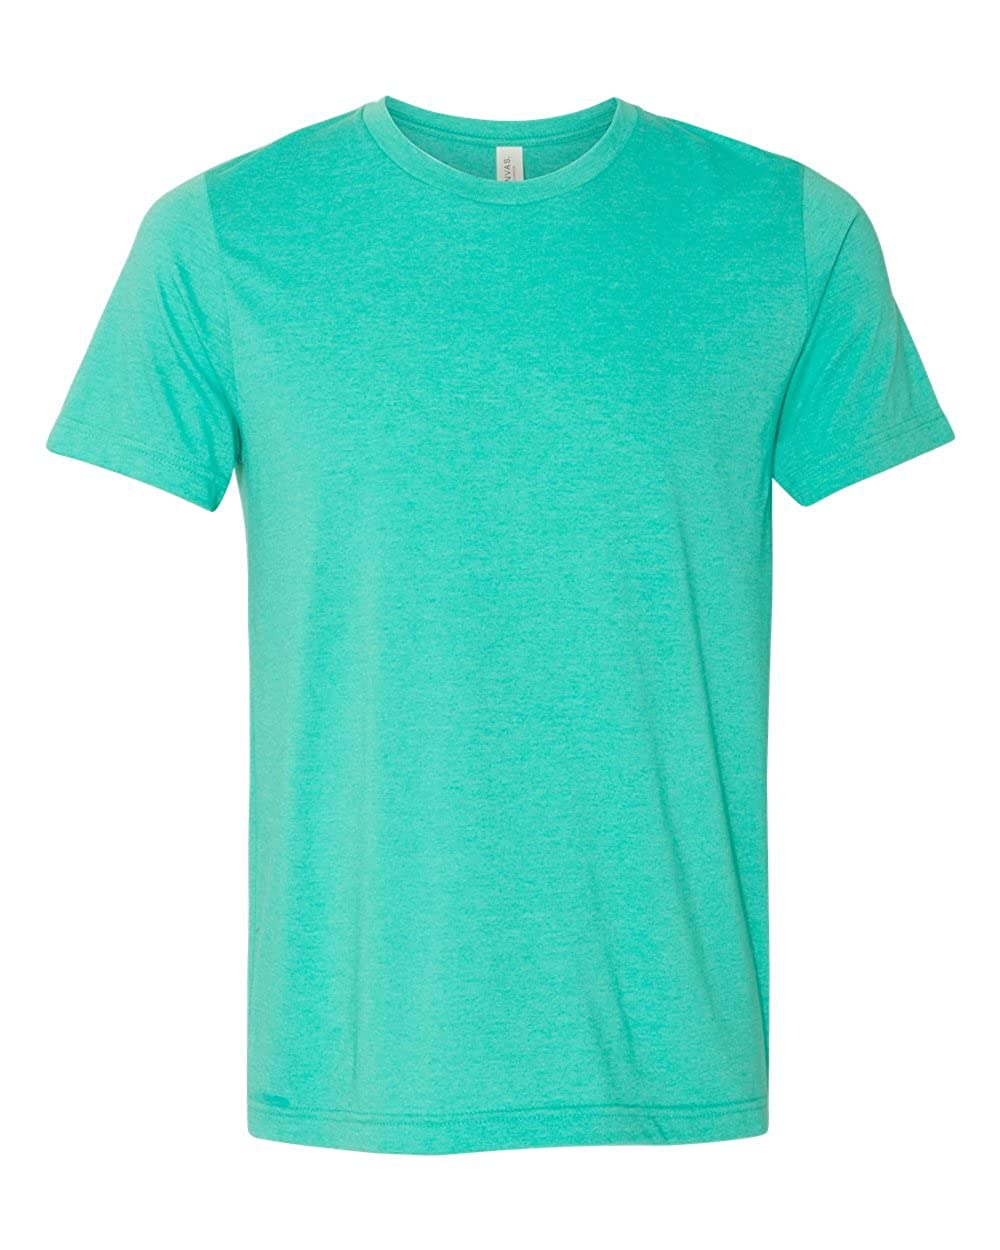 HEATHER SEA GRN Style # 3001C - Original Label 3XL - Bella Canvas Unisex Jersey Short-Sleeve T-Shirt